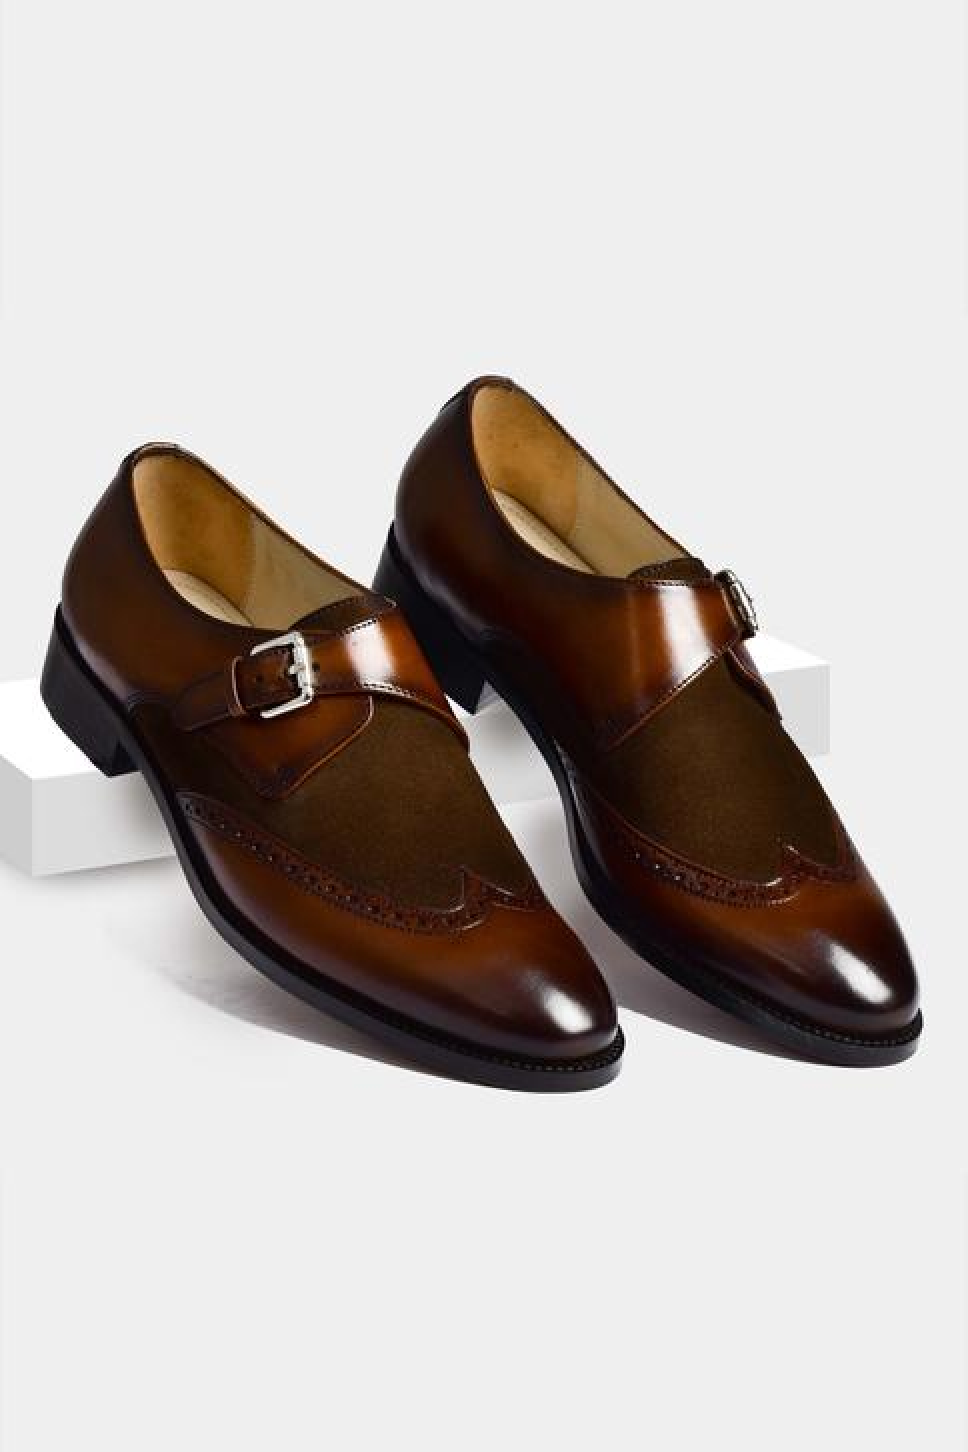 Single Monk Brogue Shoes